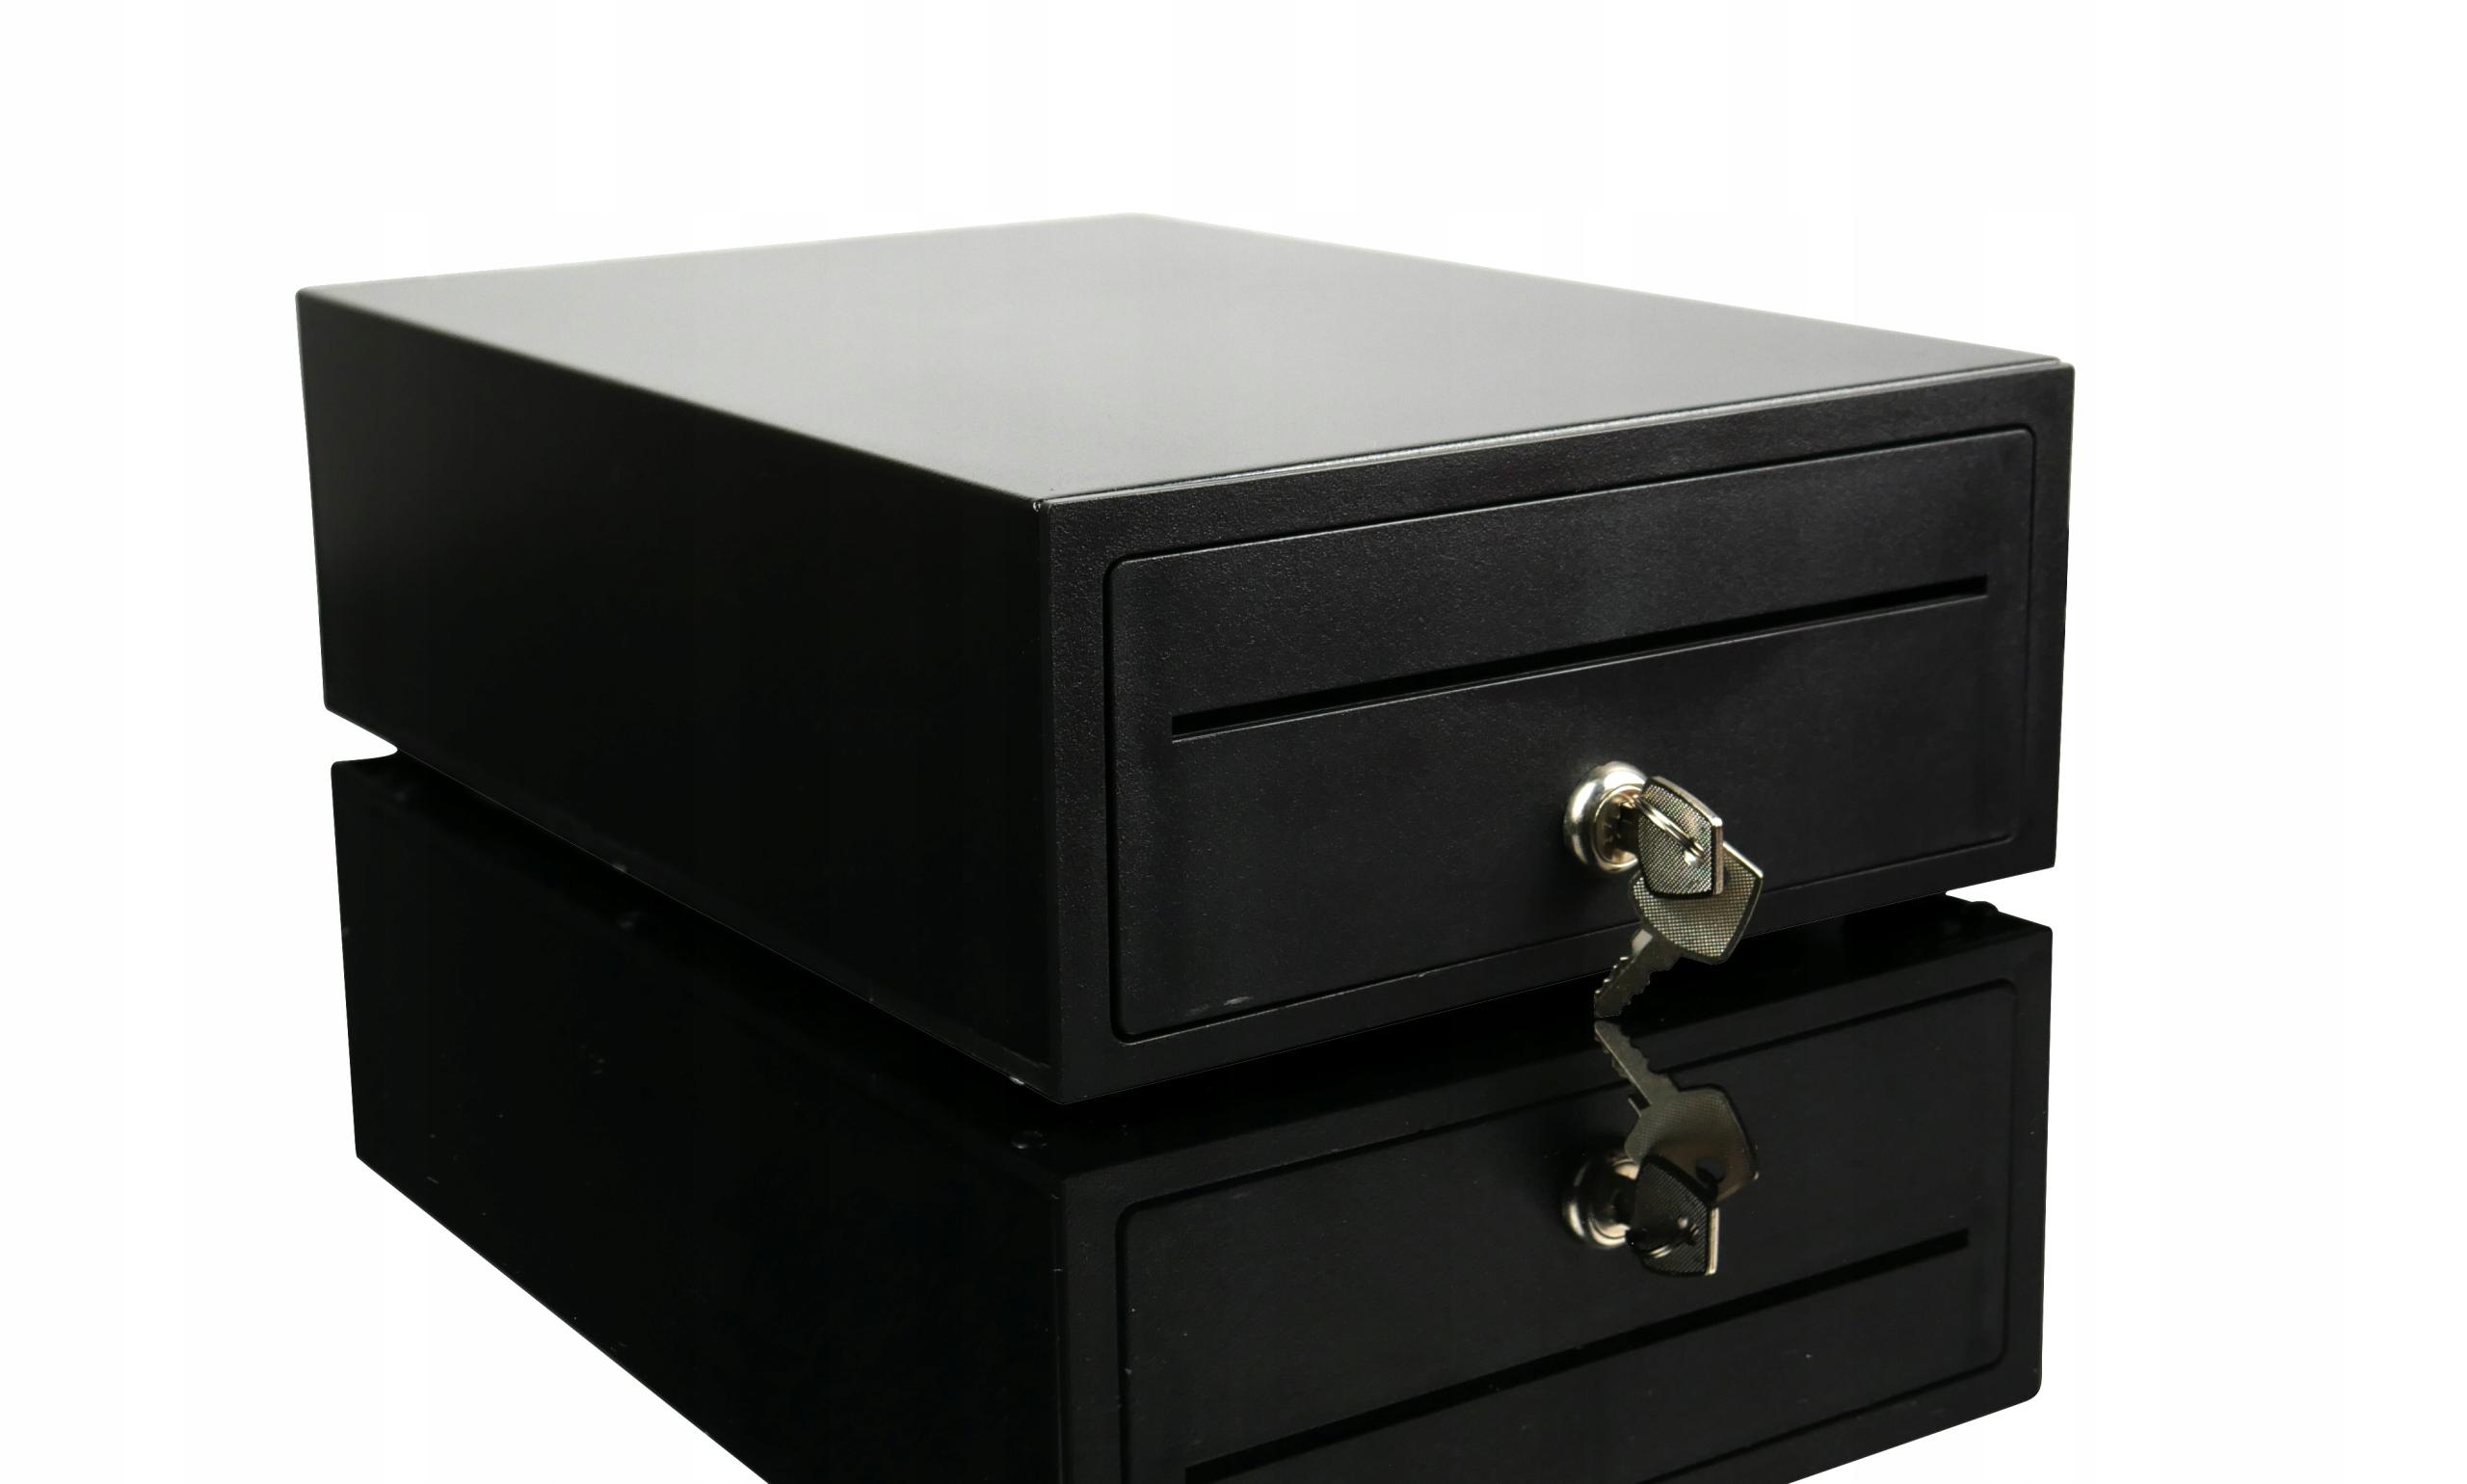 Szuflada kasowa KER-205 do kas fiskalnych drukarek